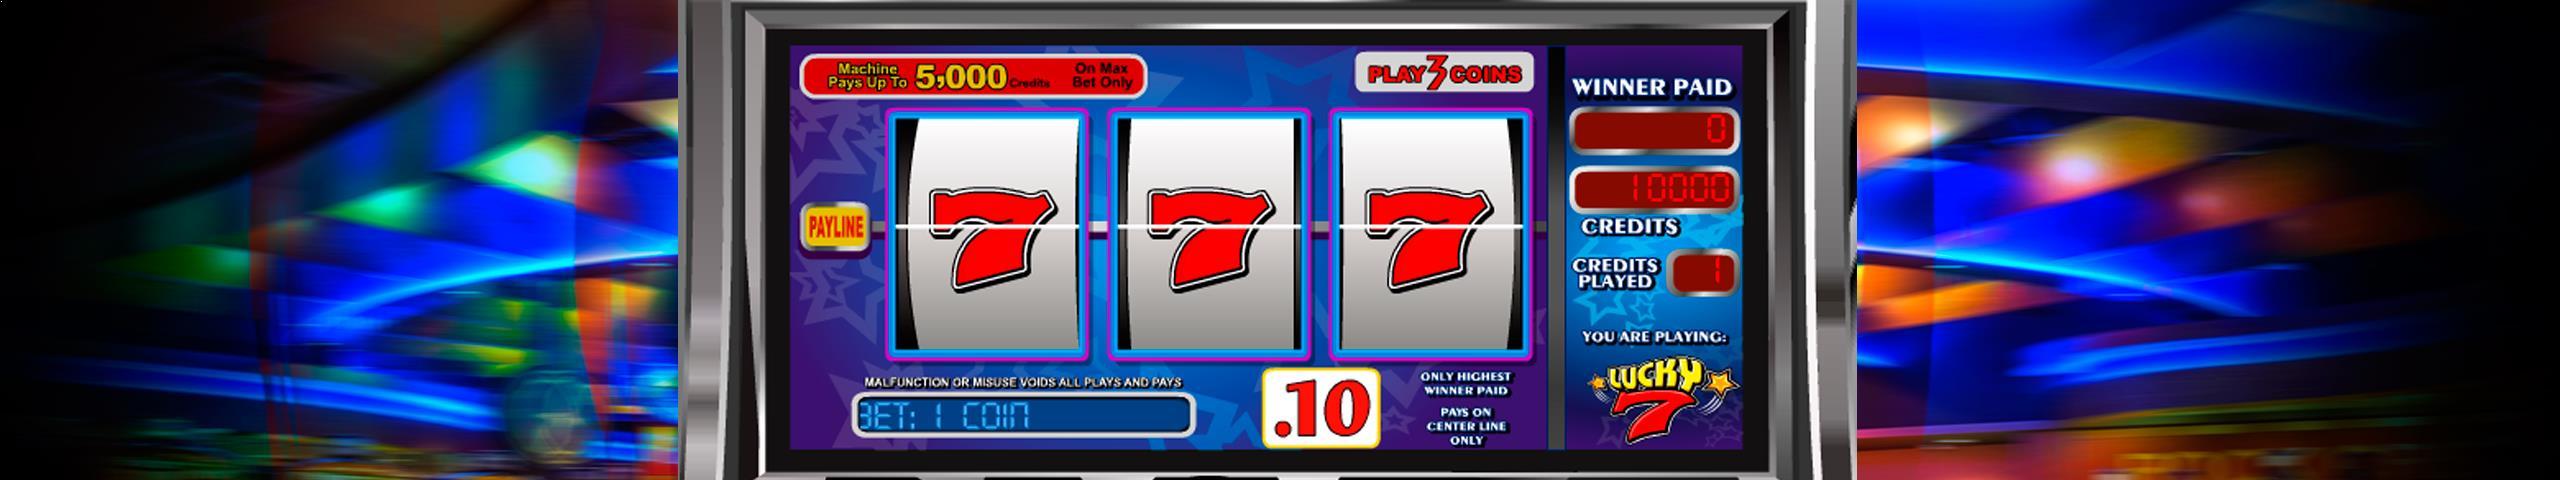 Lucky 7 Slots multabafta IGT jocuri slot slider